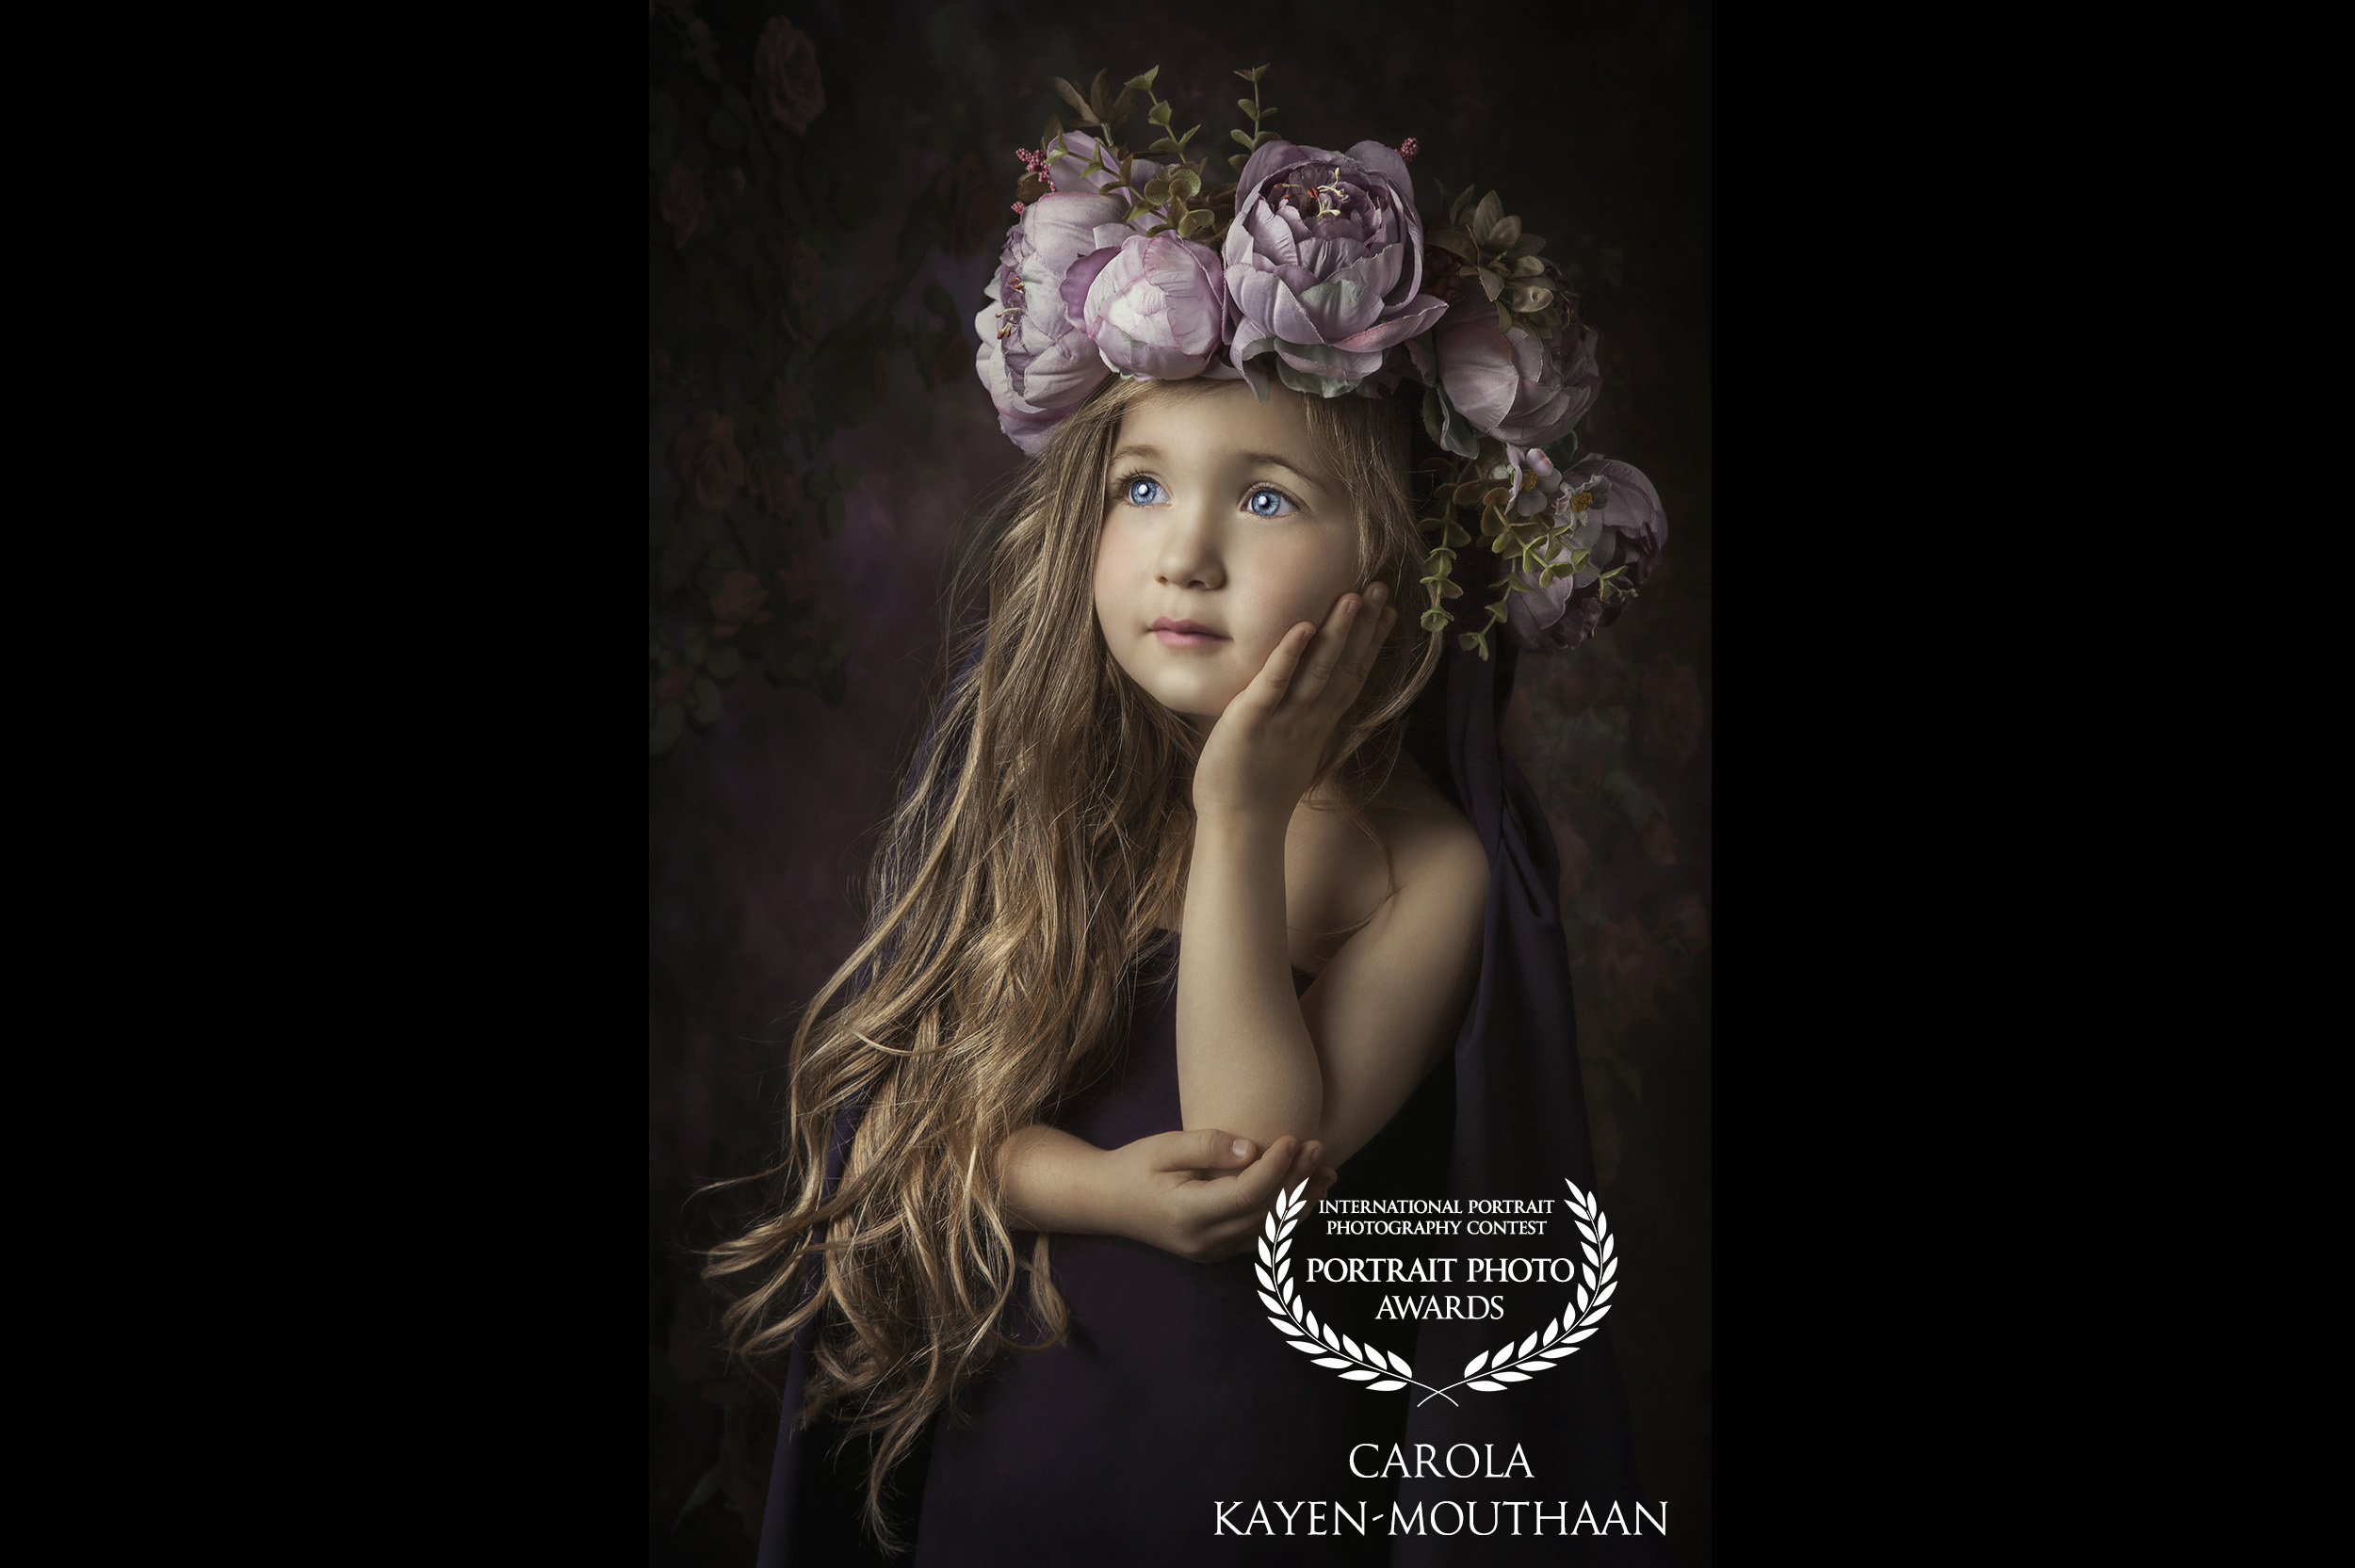 custom_logo_CAROLA-KAYEN-MOUTHAAN-netherlands-39collection-portraitphotoawards-net_1561120769